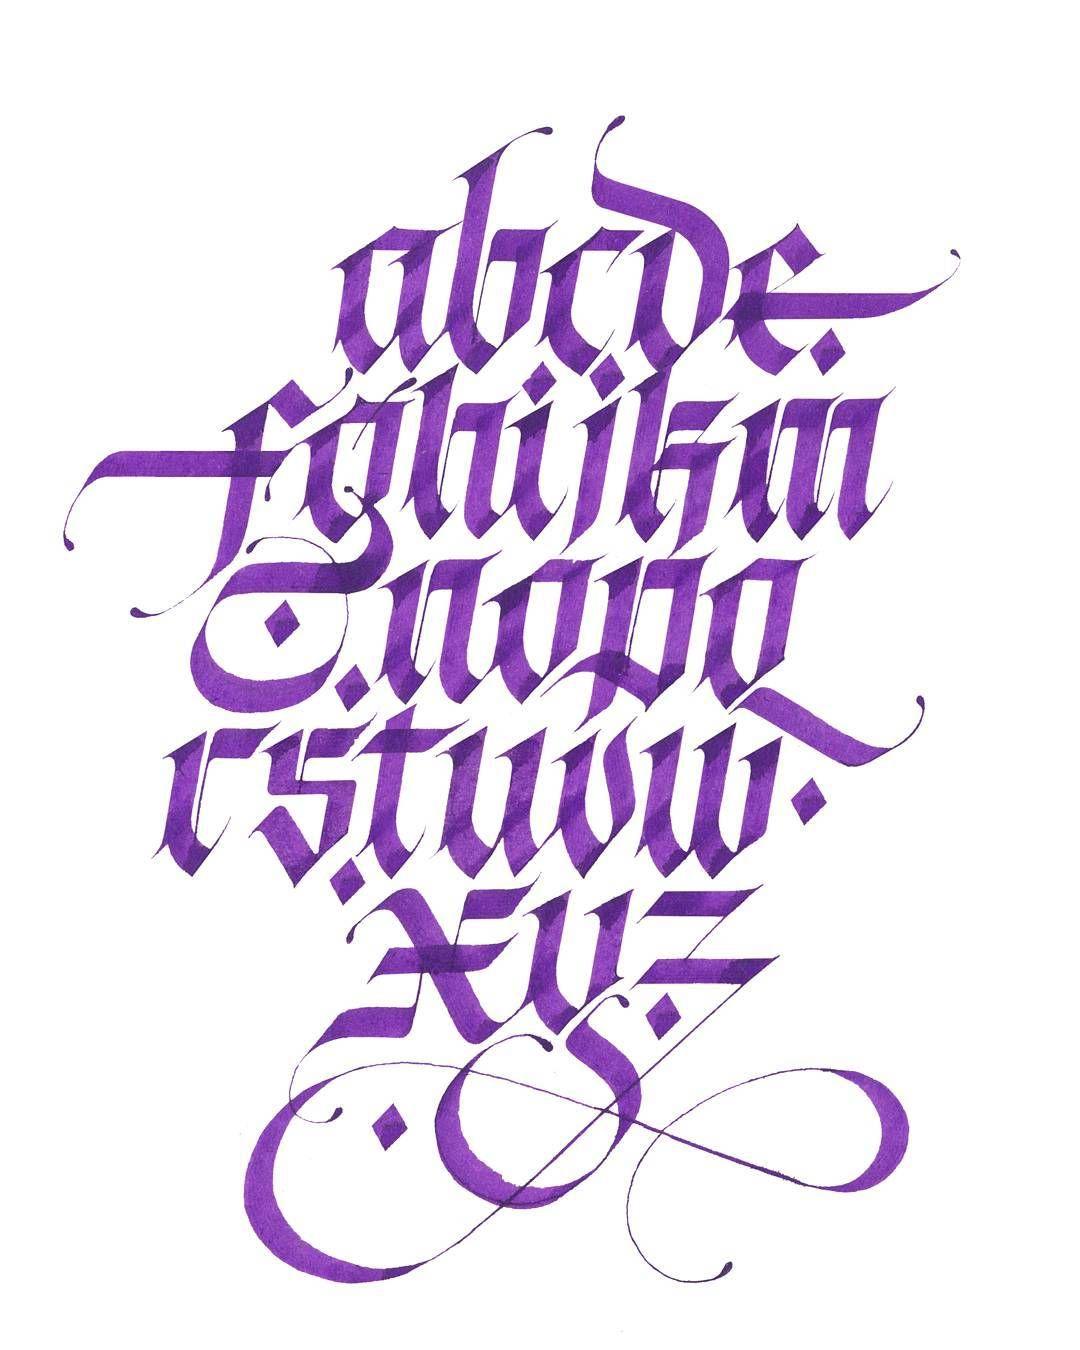 Purple Alphabets Loveletters Instagood Instatype Calligraphymasters Calligraphy Calligraffiti Calligraphyph Calligraphyart Goodtype